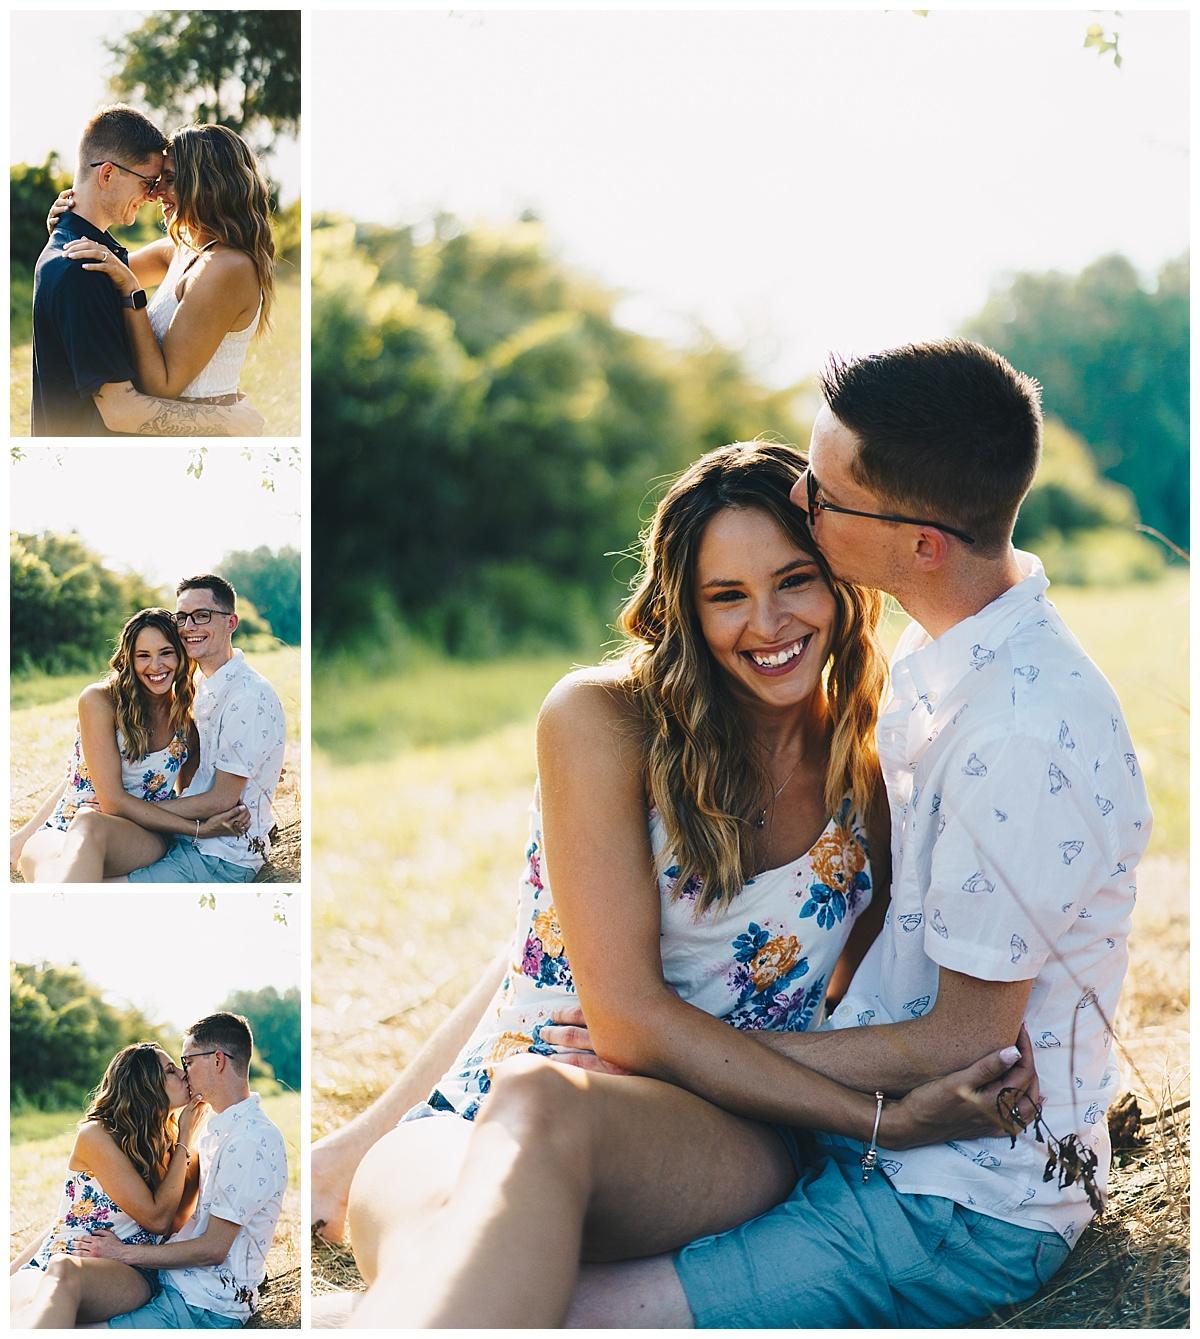 Nashville Wedding Photographer_N&L Engagement Session-11